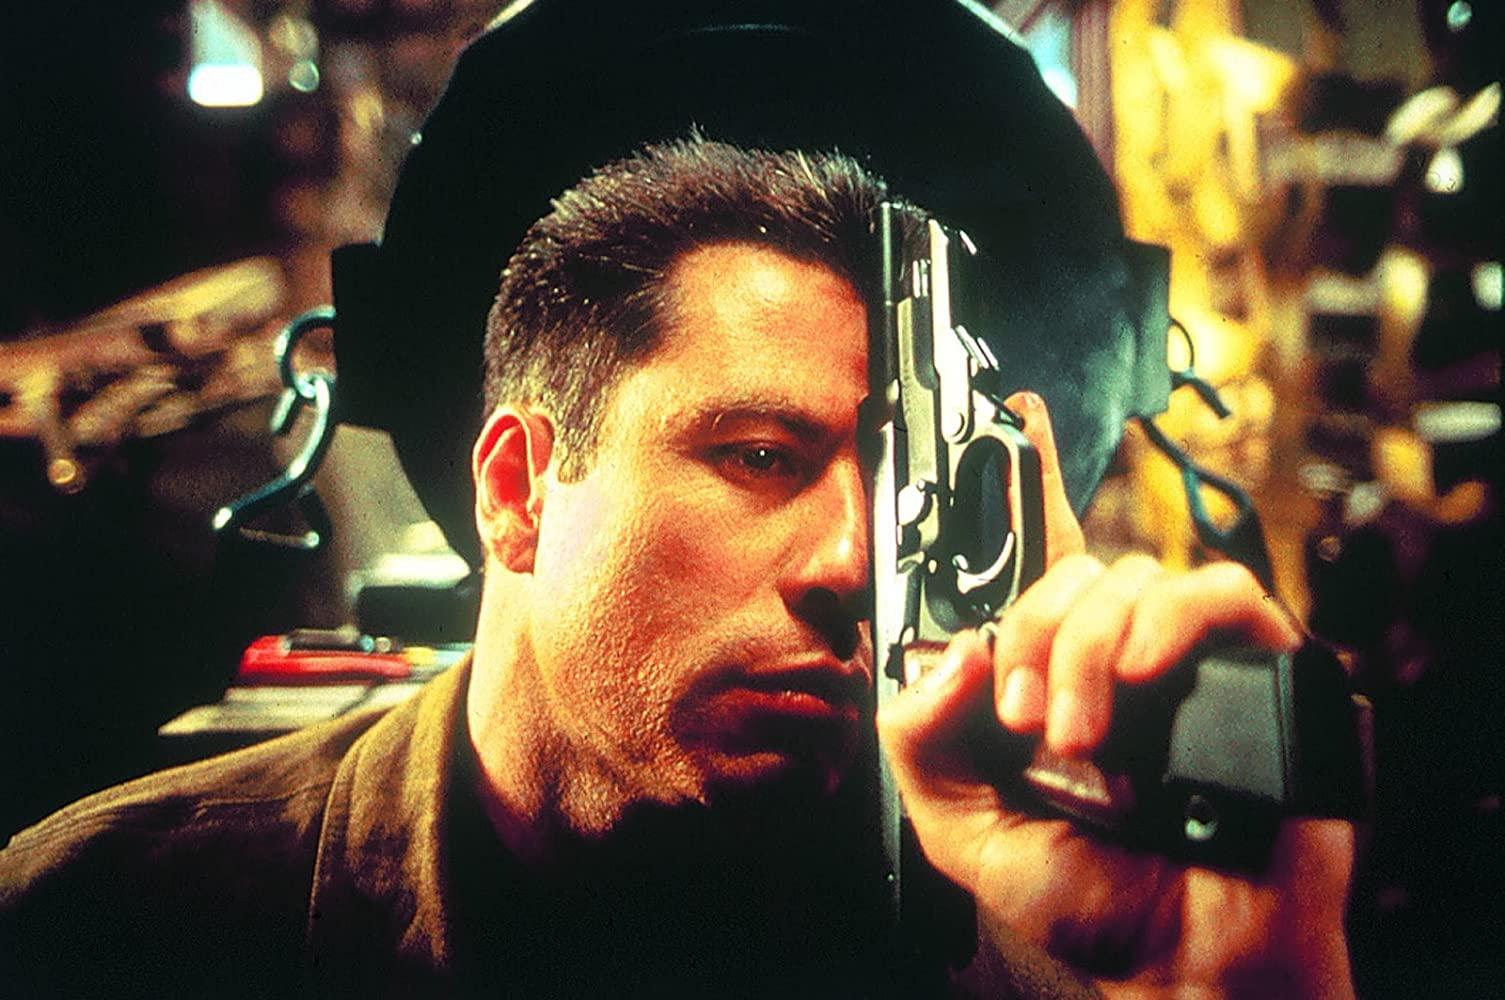 John Travolta as Major Vic Deakins in Broken Arrow (1995)